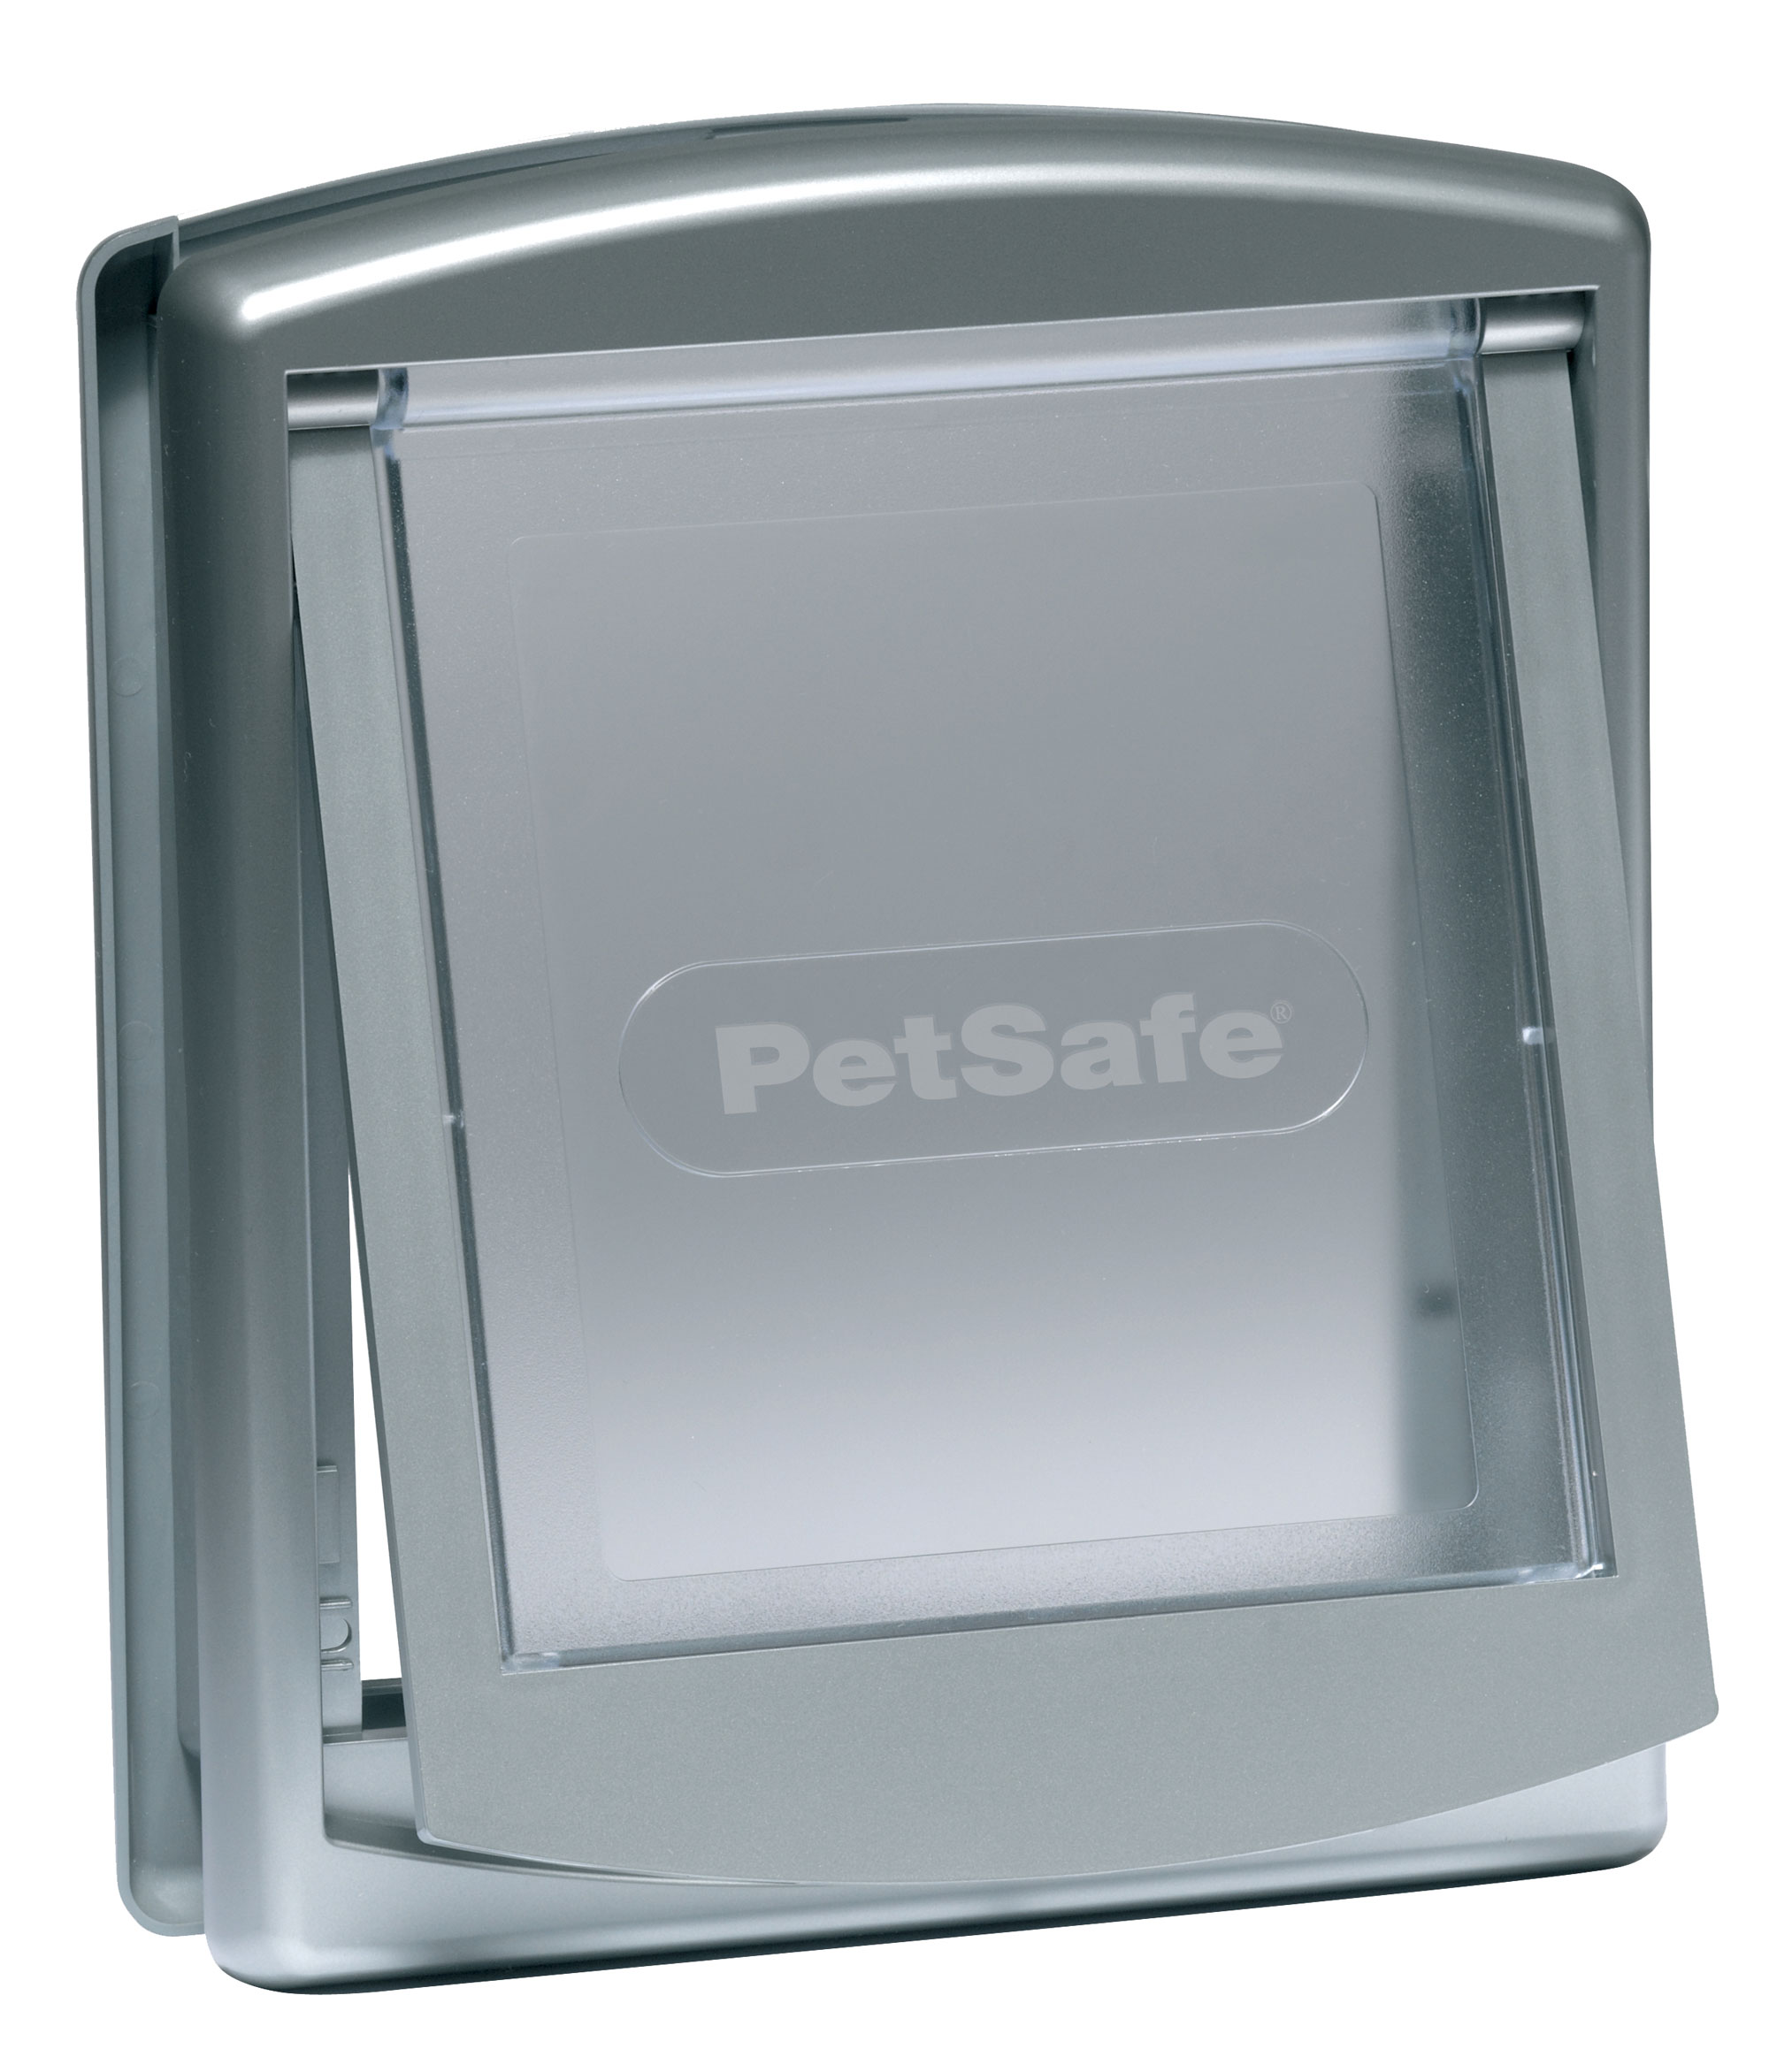 Hundetür / Hundeklappe PetSafe Staywell Original mittel 352x294mm grau Bild 1